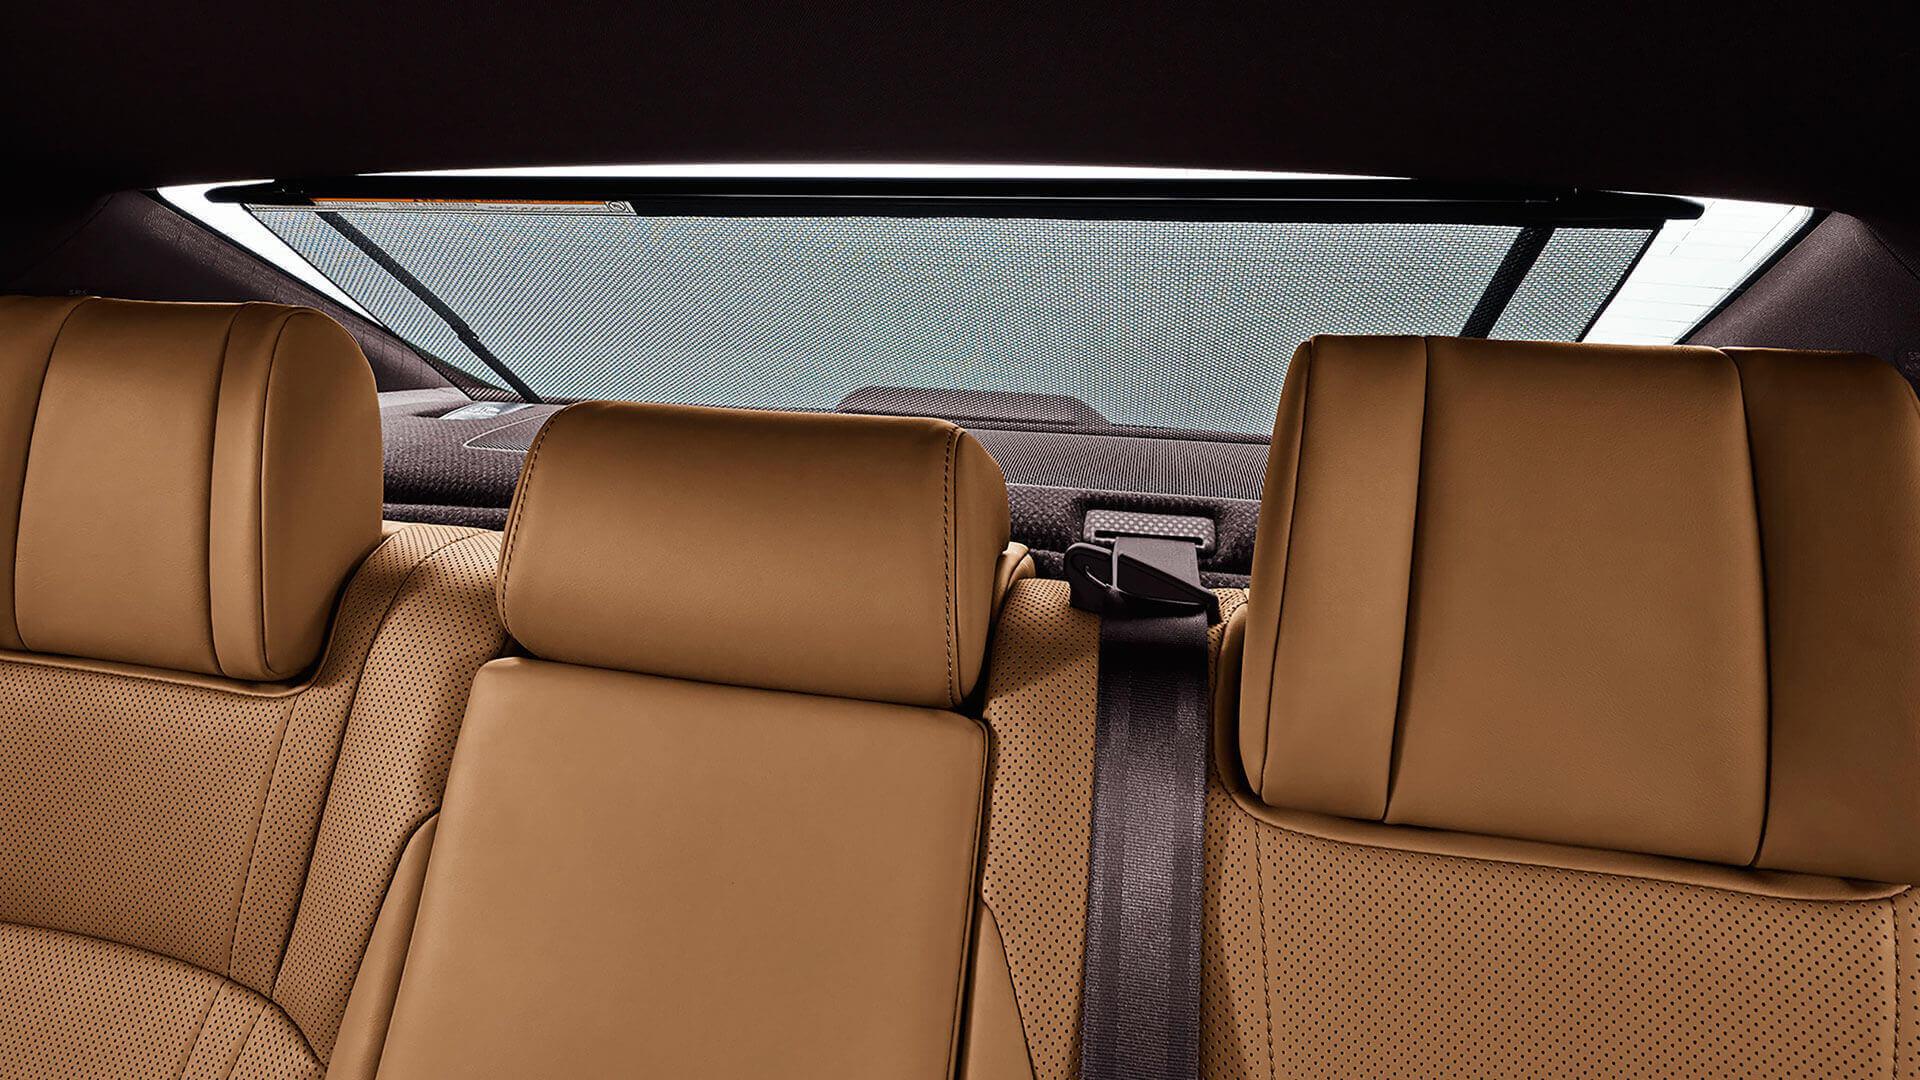 2019 lexus es hybrid experience feature rear sun shade